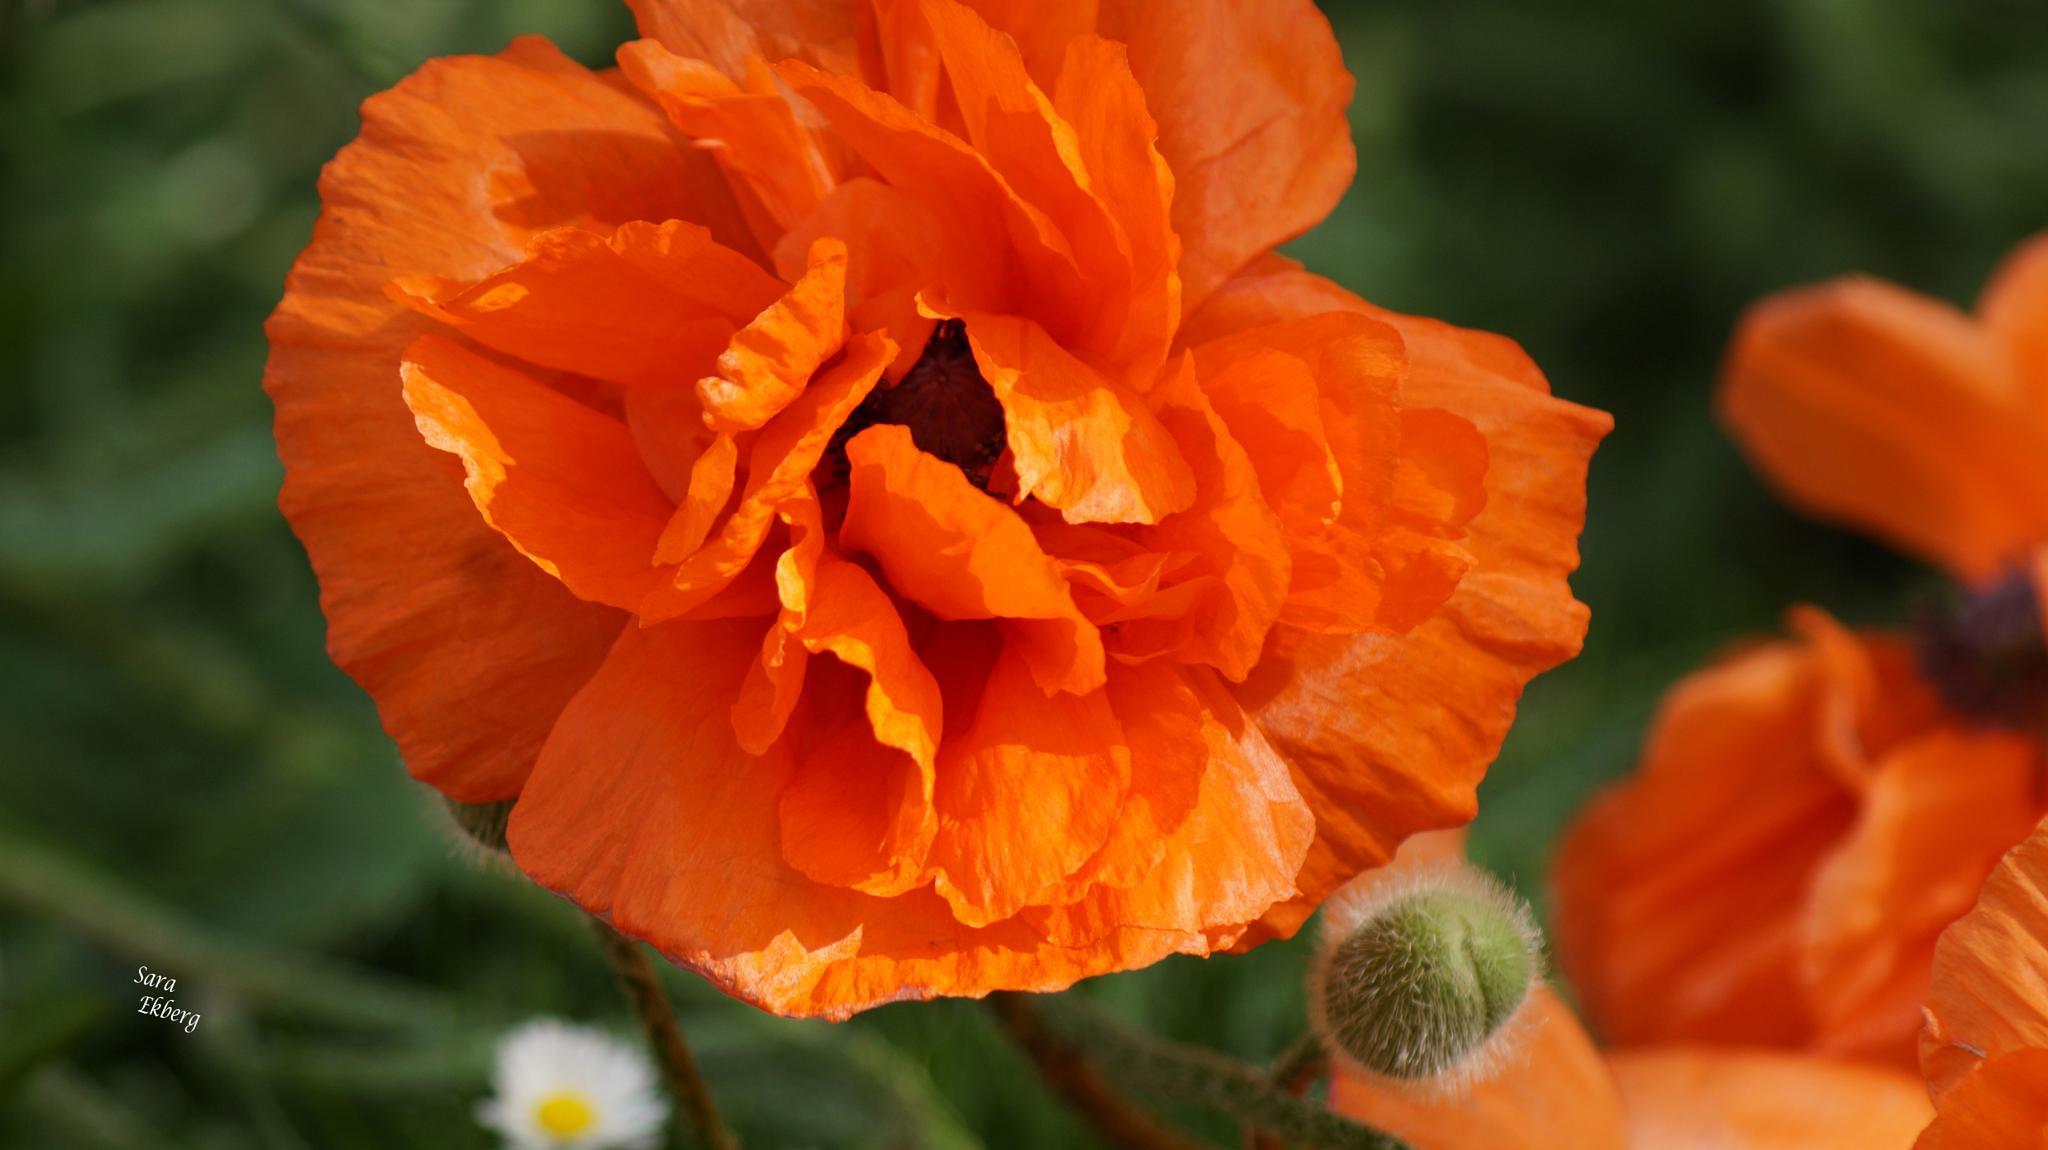 Poppy flower. by SaraEkberg